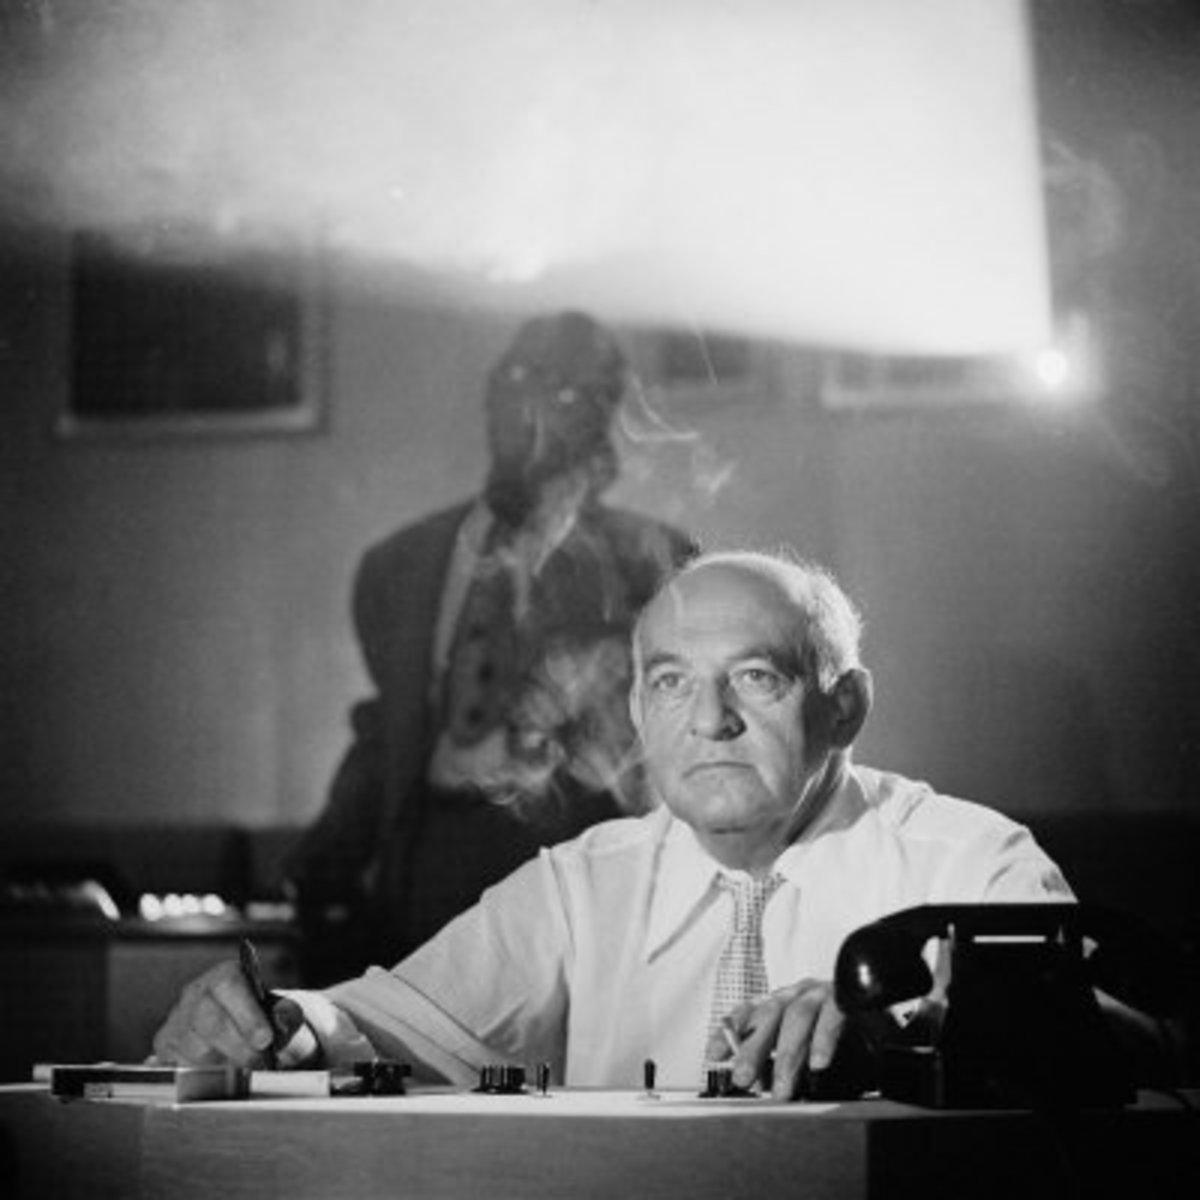 Harry Cohn in Screening Room